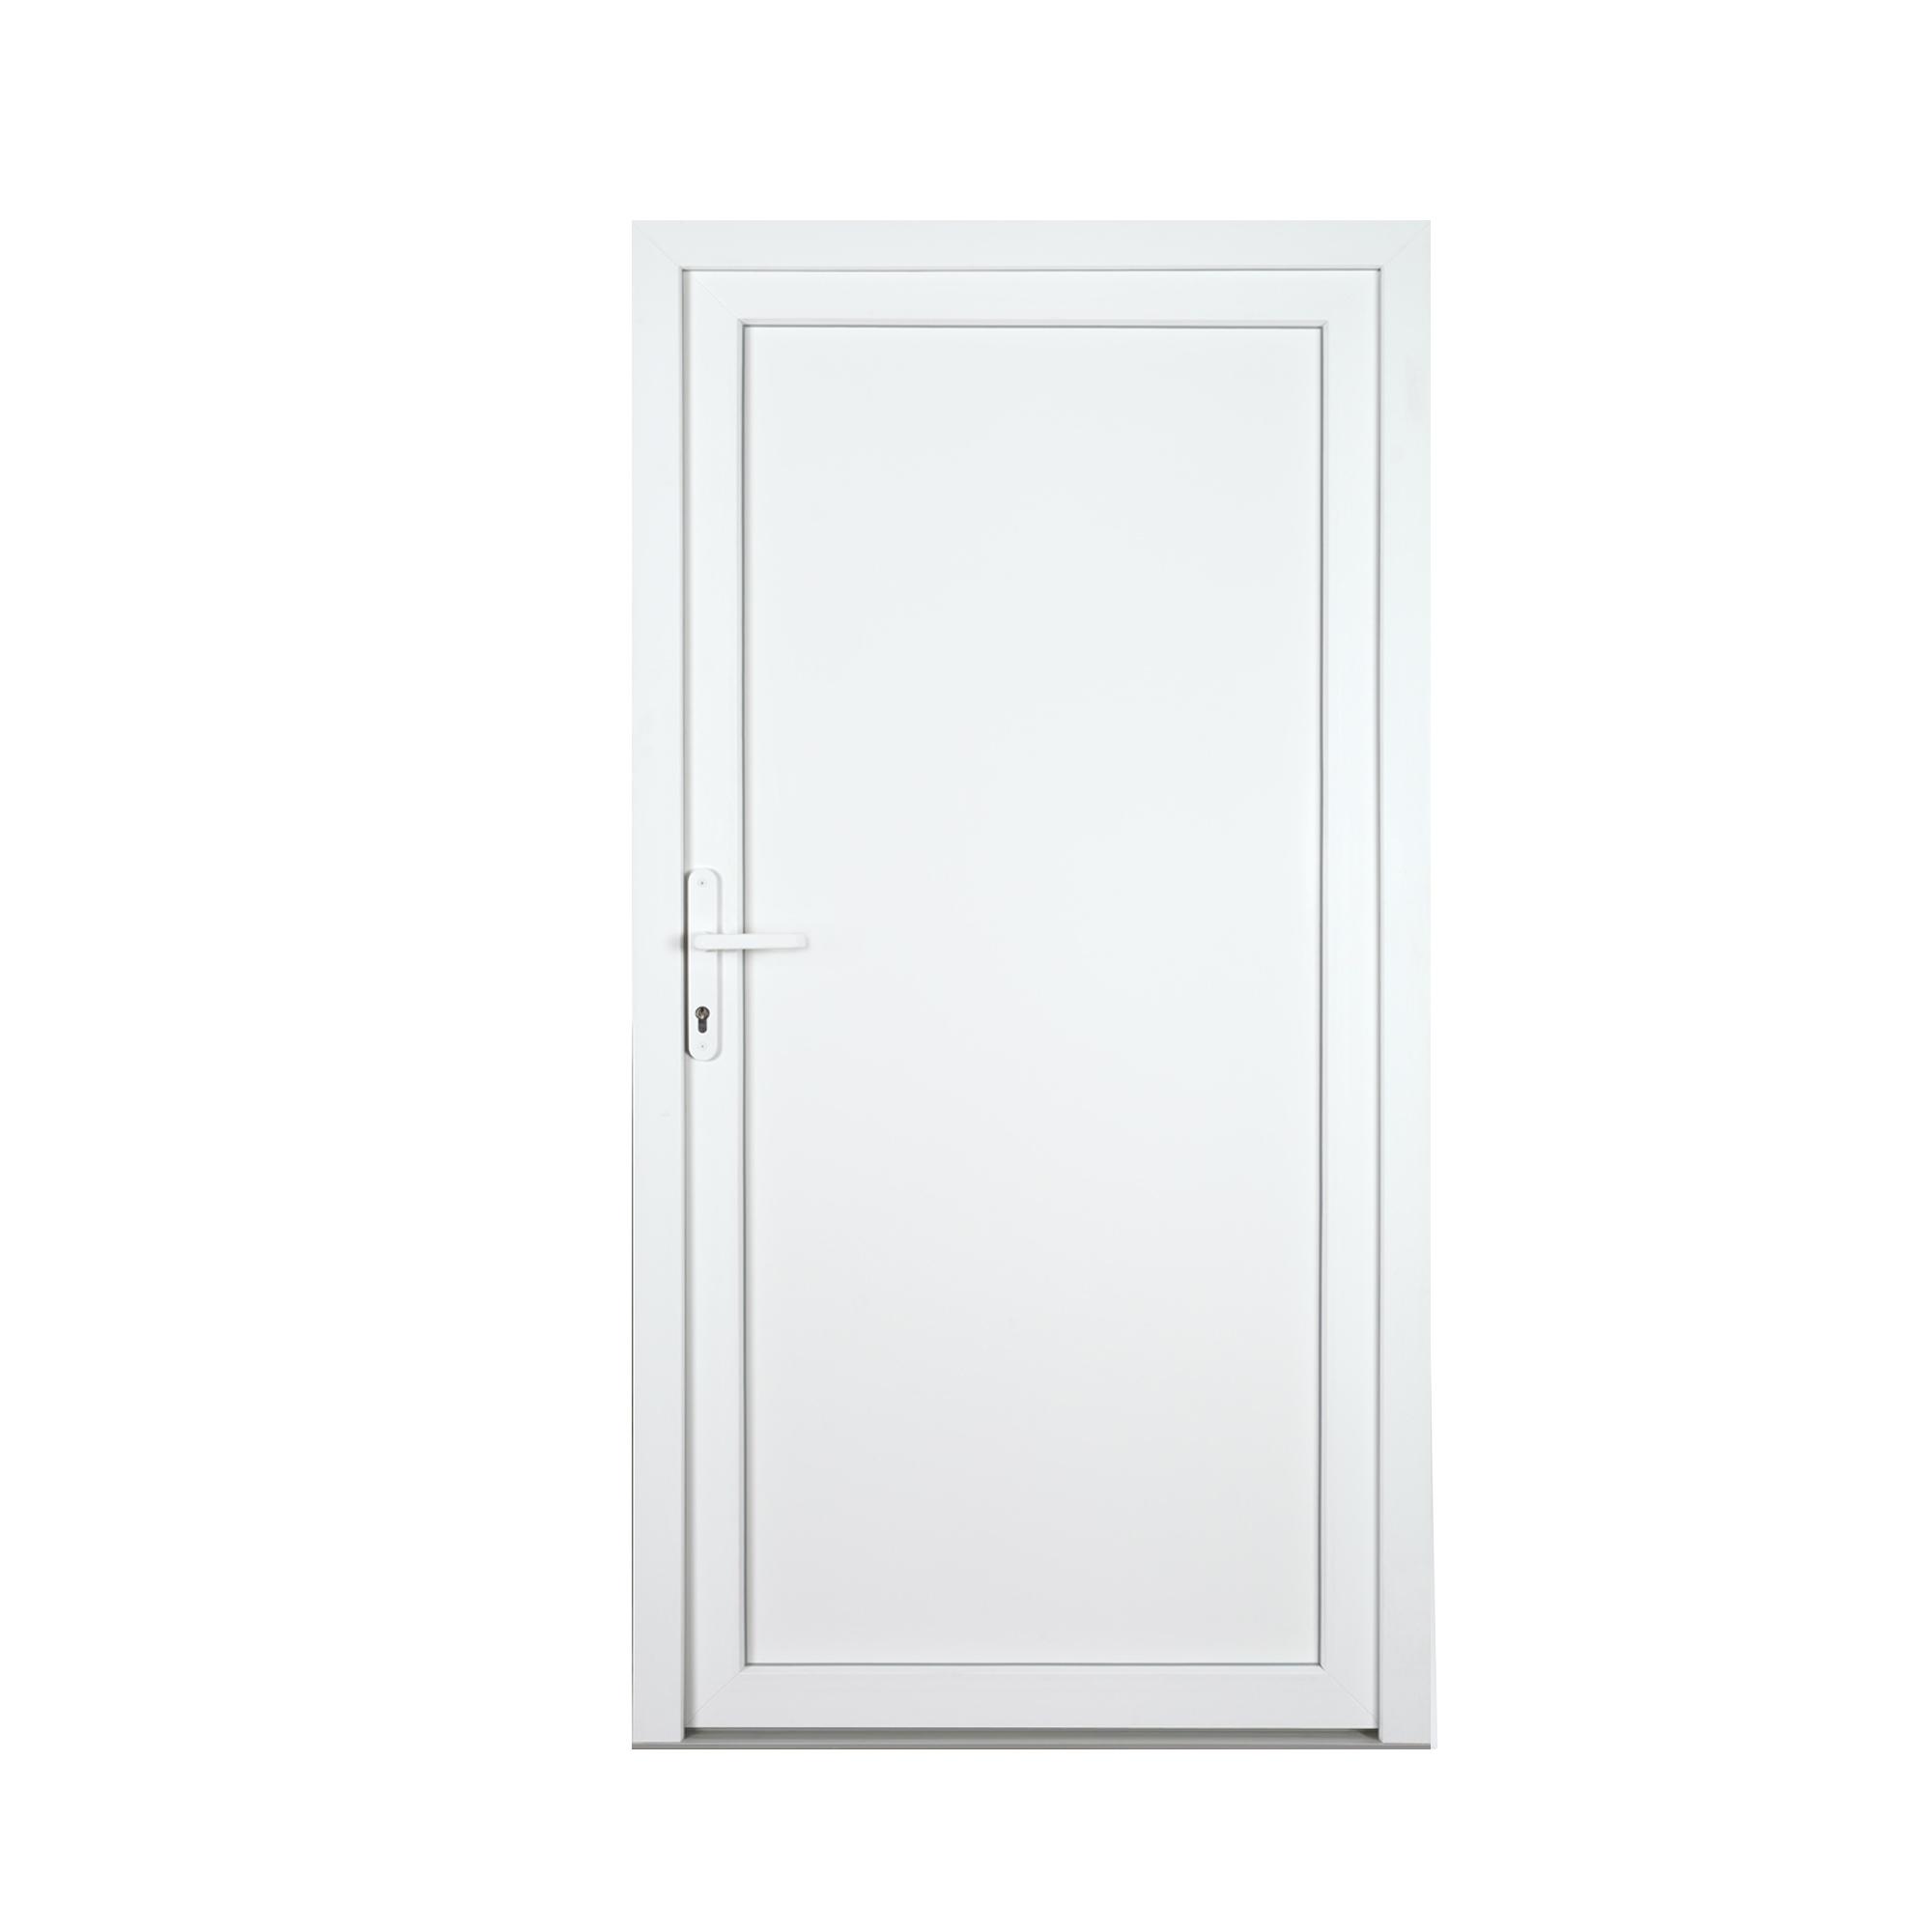 Keller Nebeneingangstur Mod K604